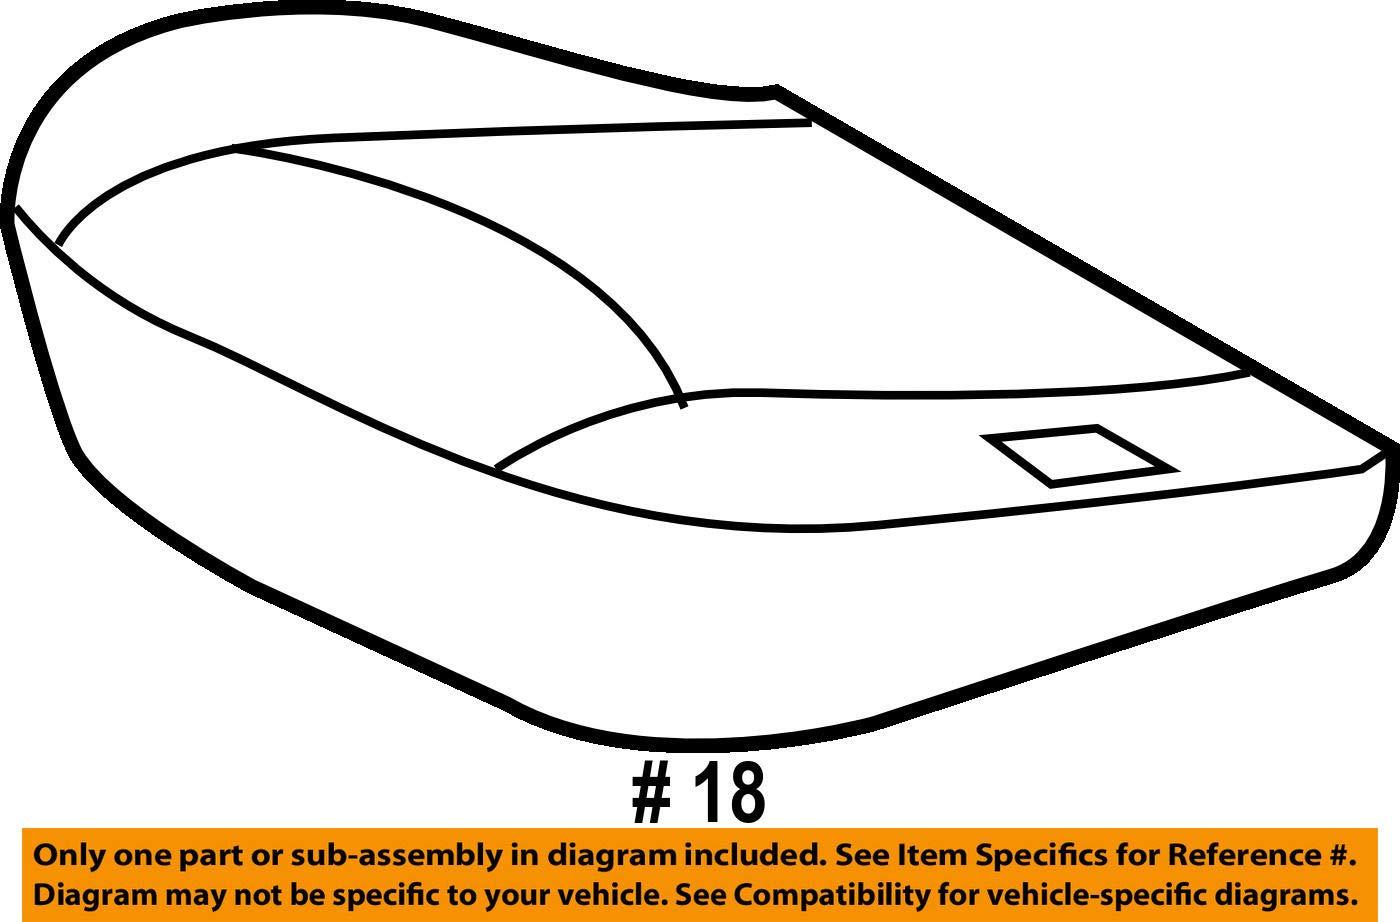 TOYOTA Genuine 71075-42404-B5 Seat Cushion Cover